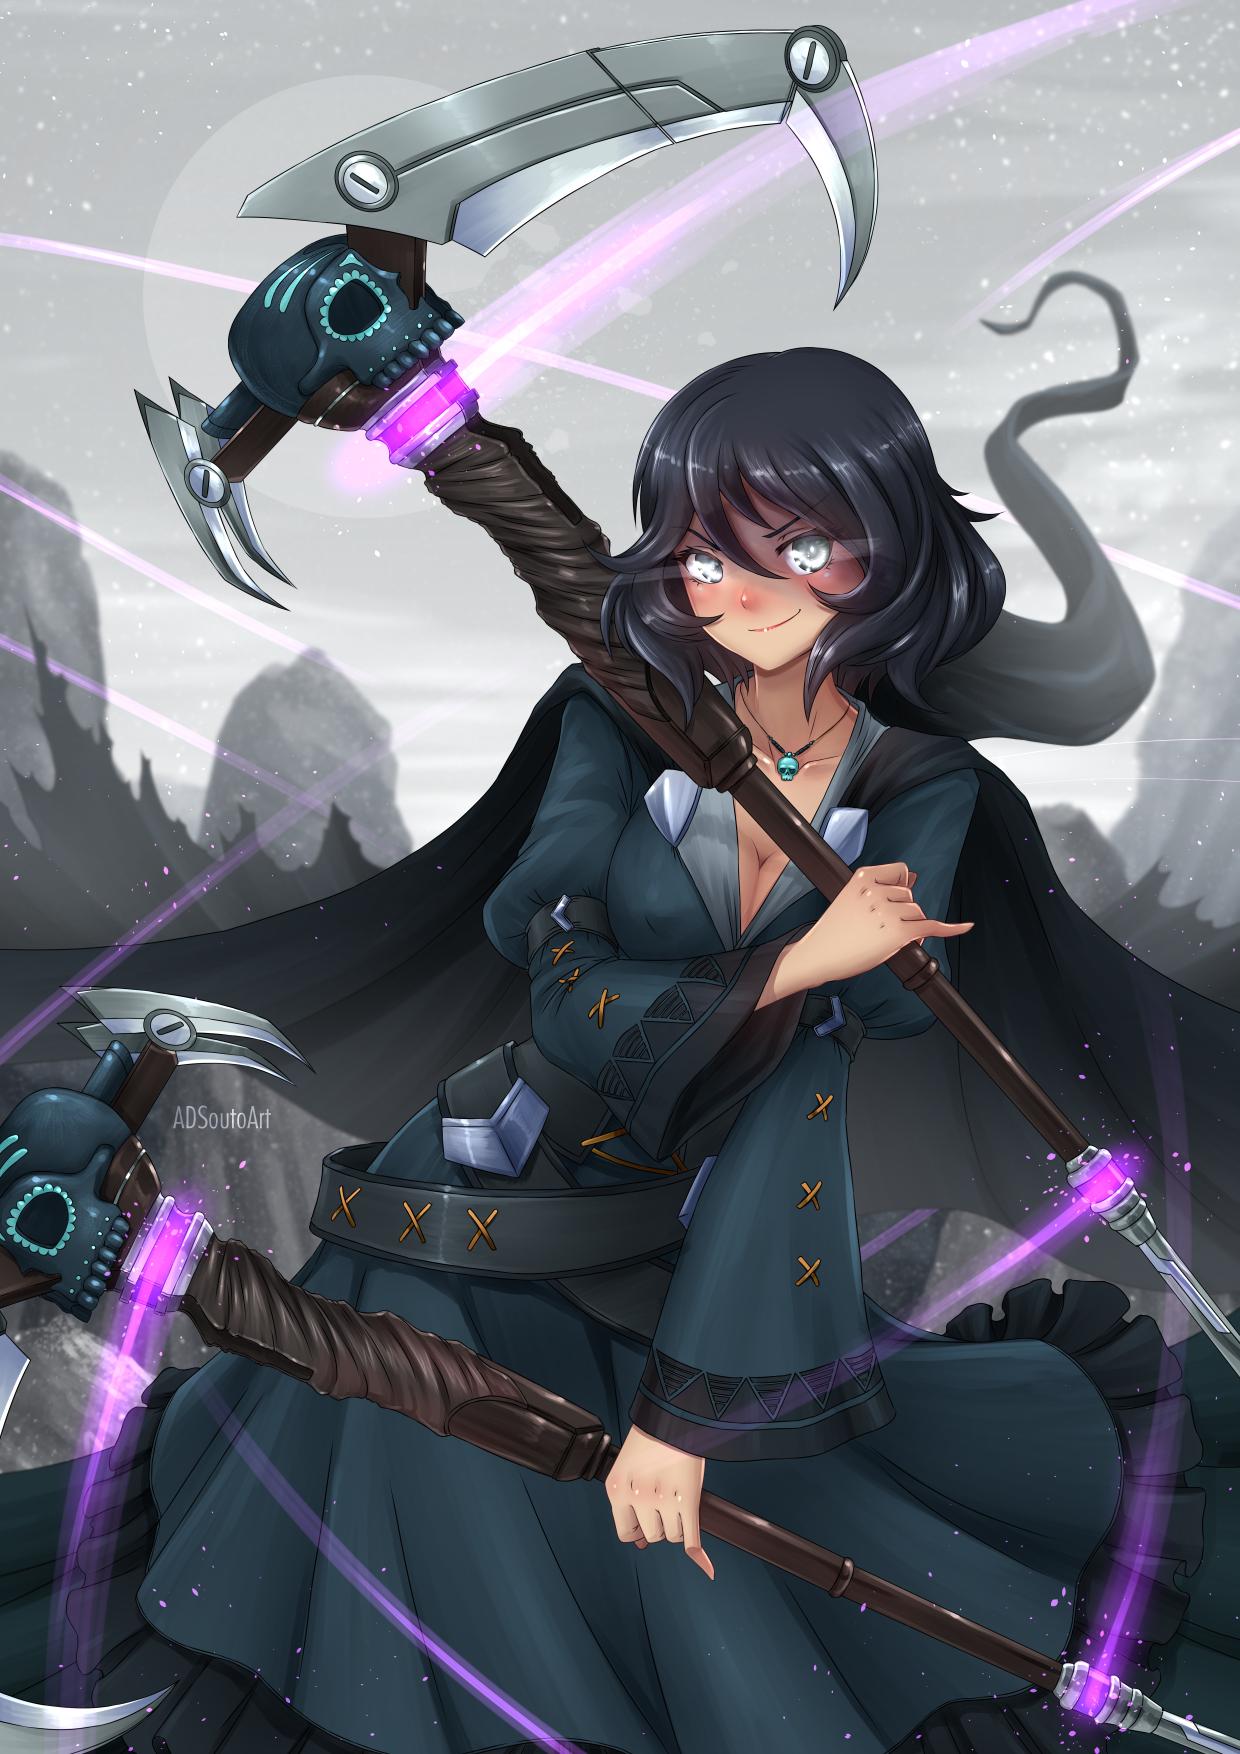 Maria Calavera, The Grim Reaper